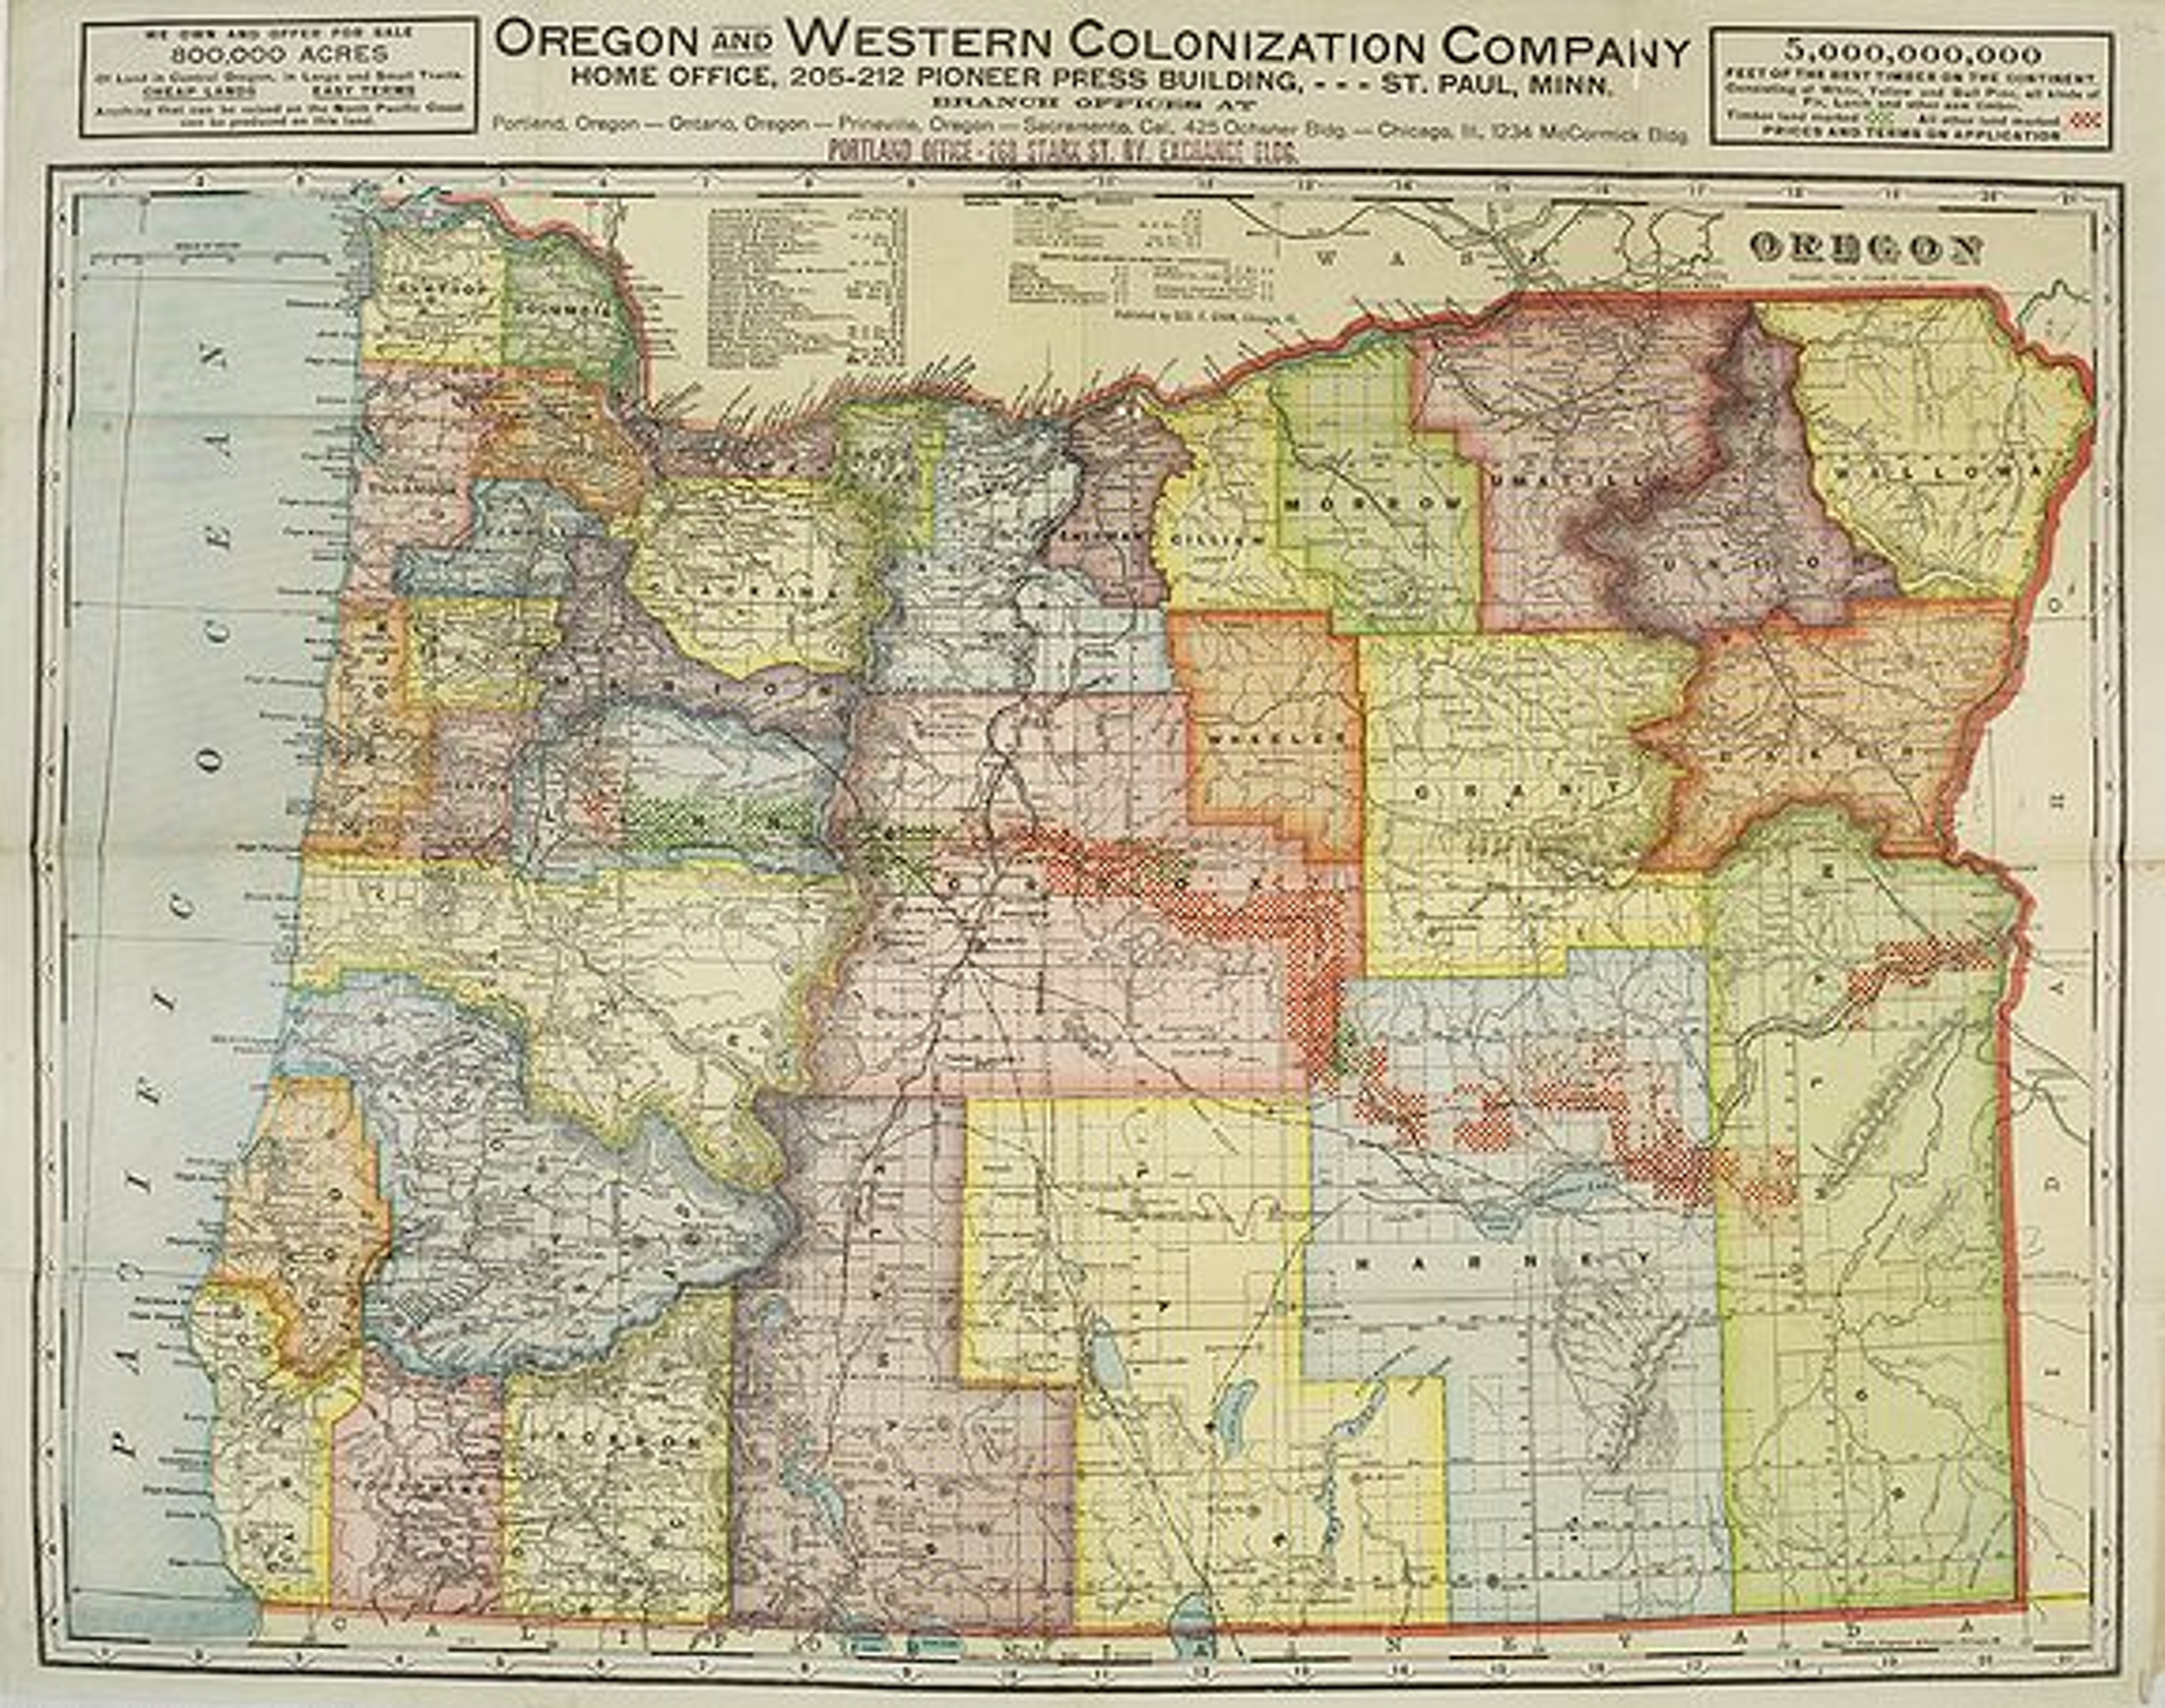 CRAM - Oregon and Western Colonization Company map of Oregon.